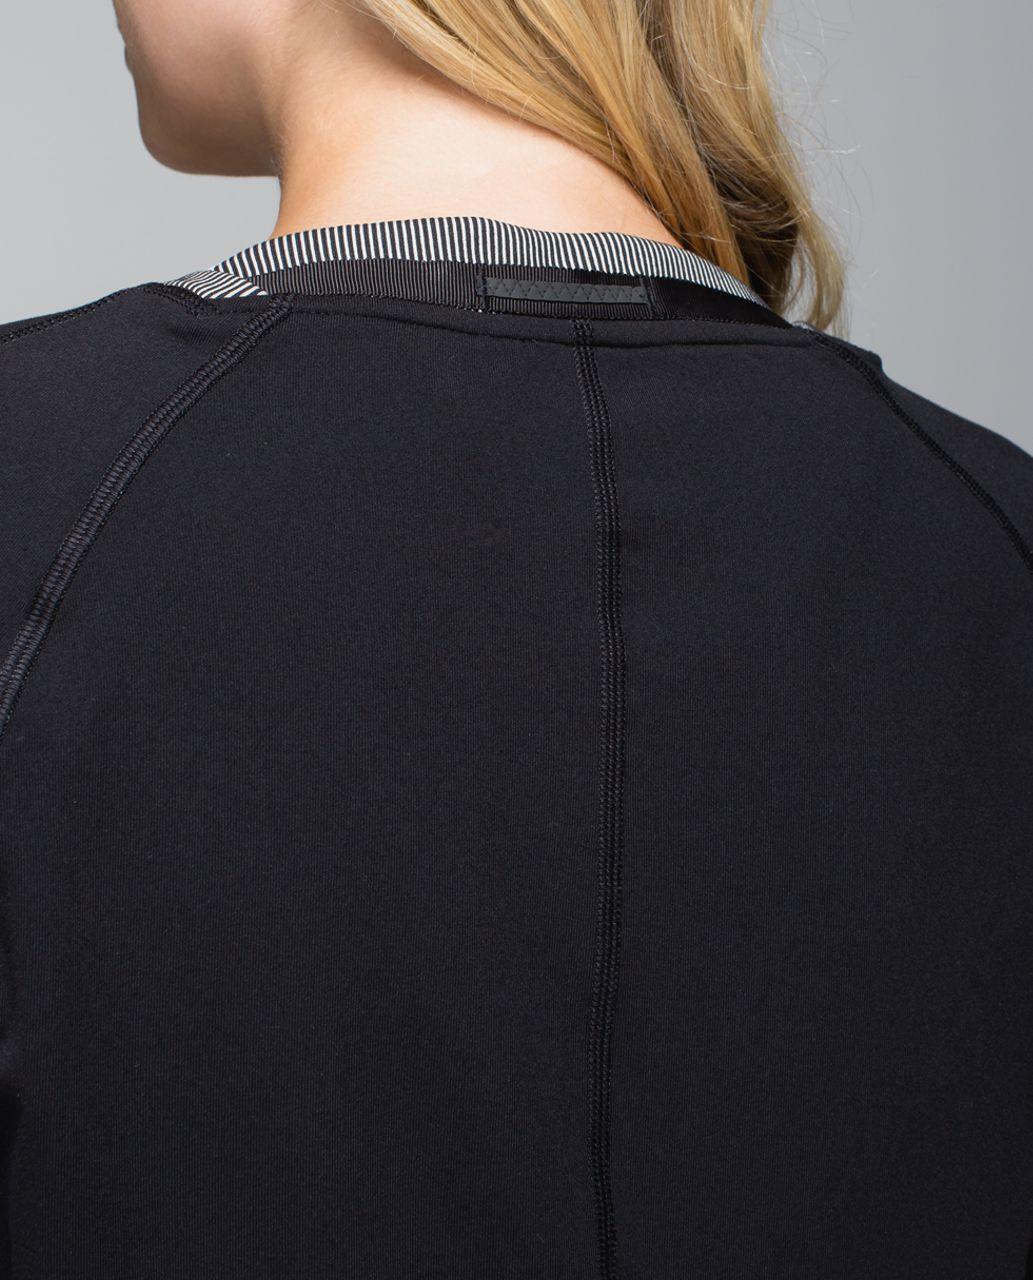 Lululemon H'Om Run Jacket - Black